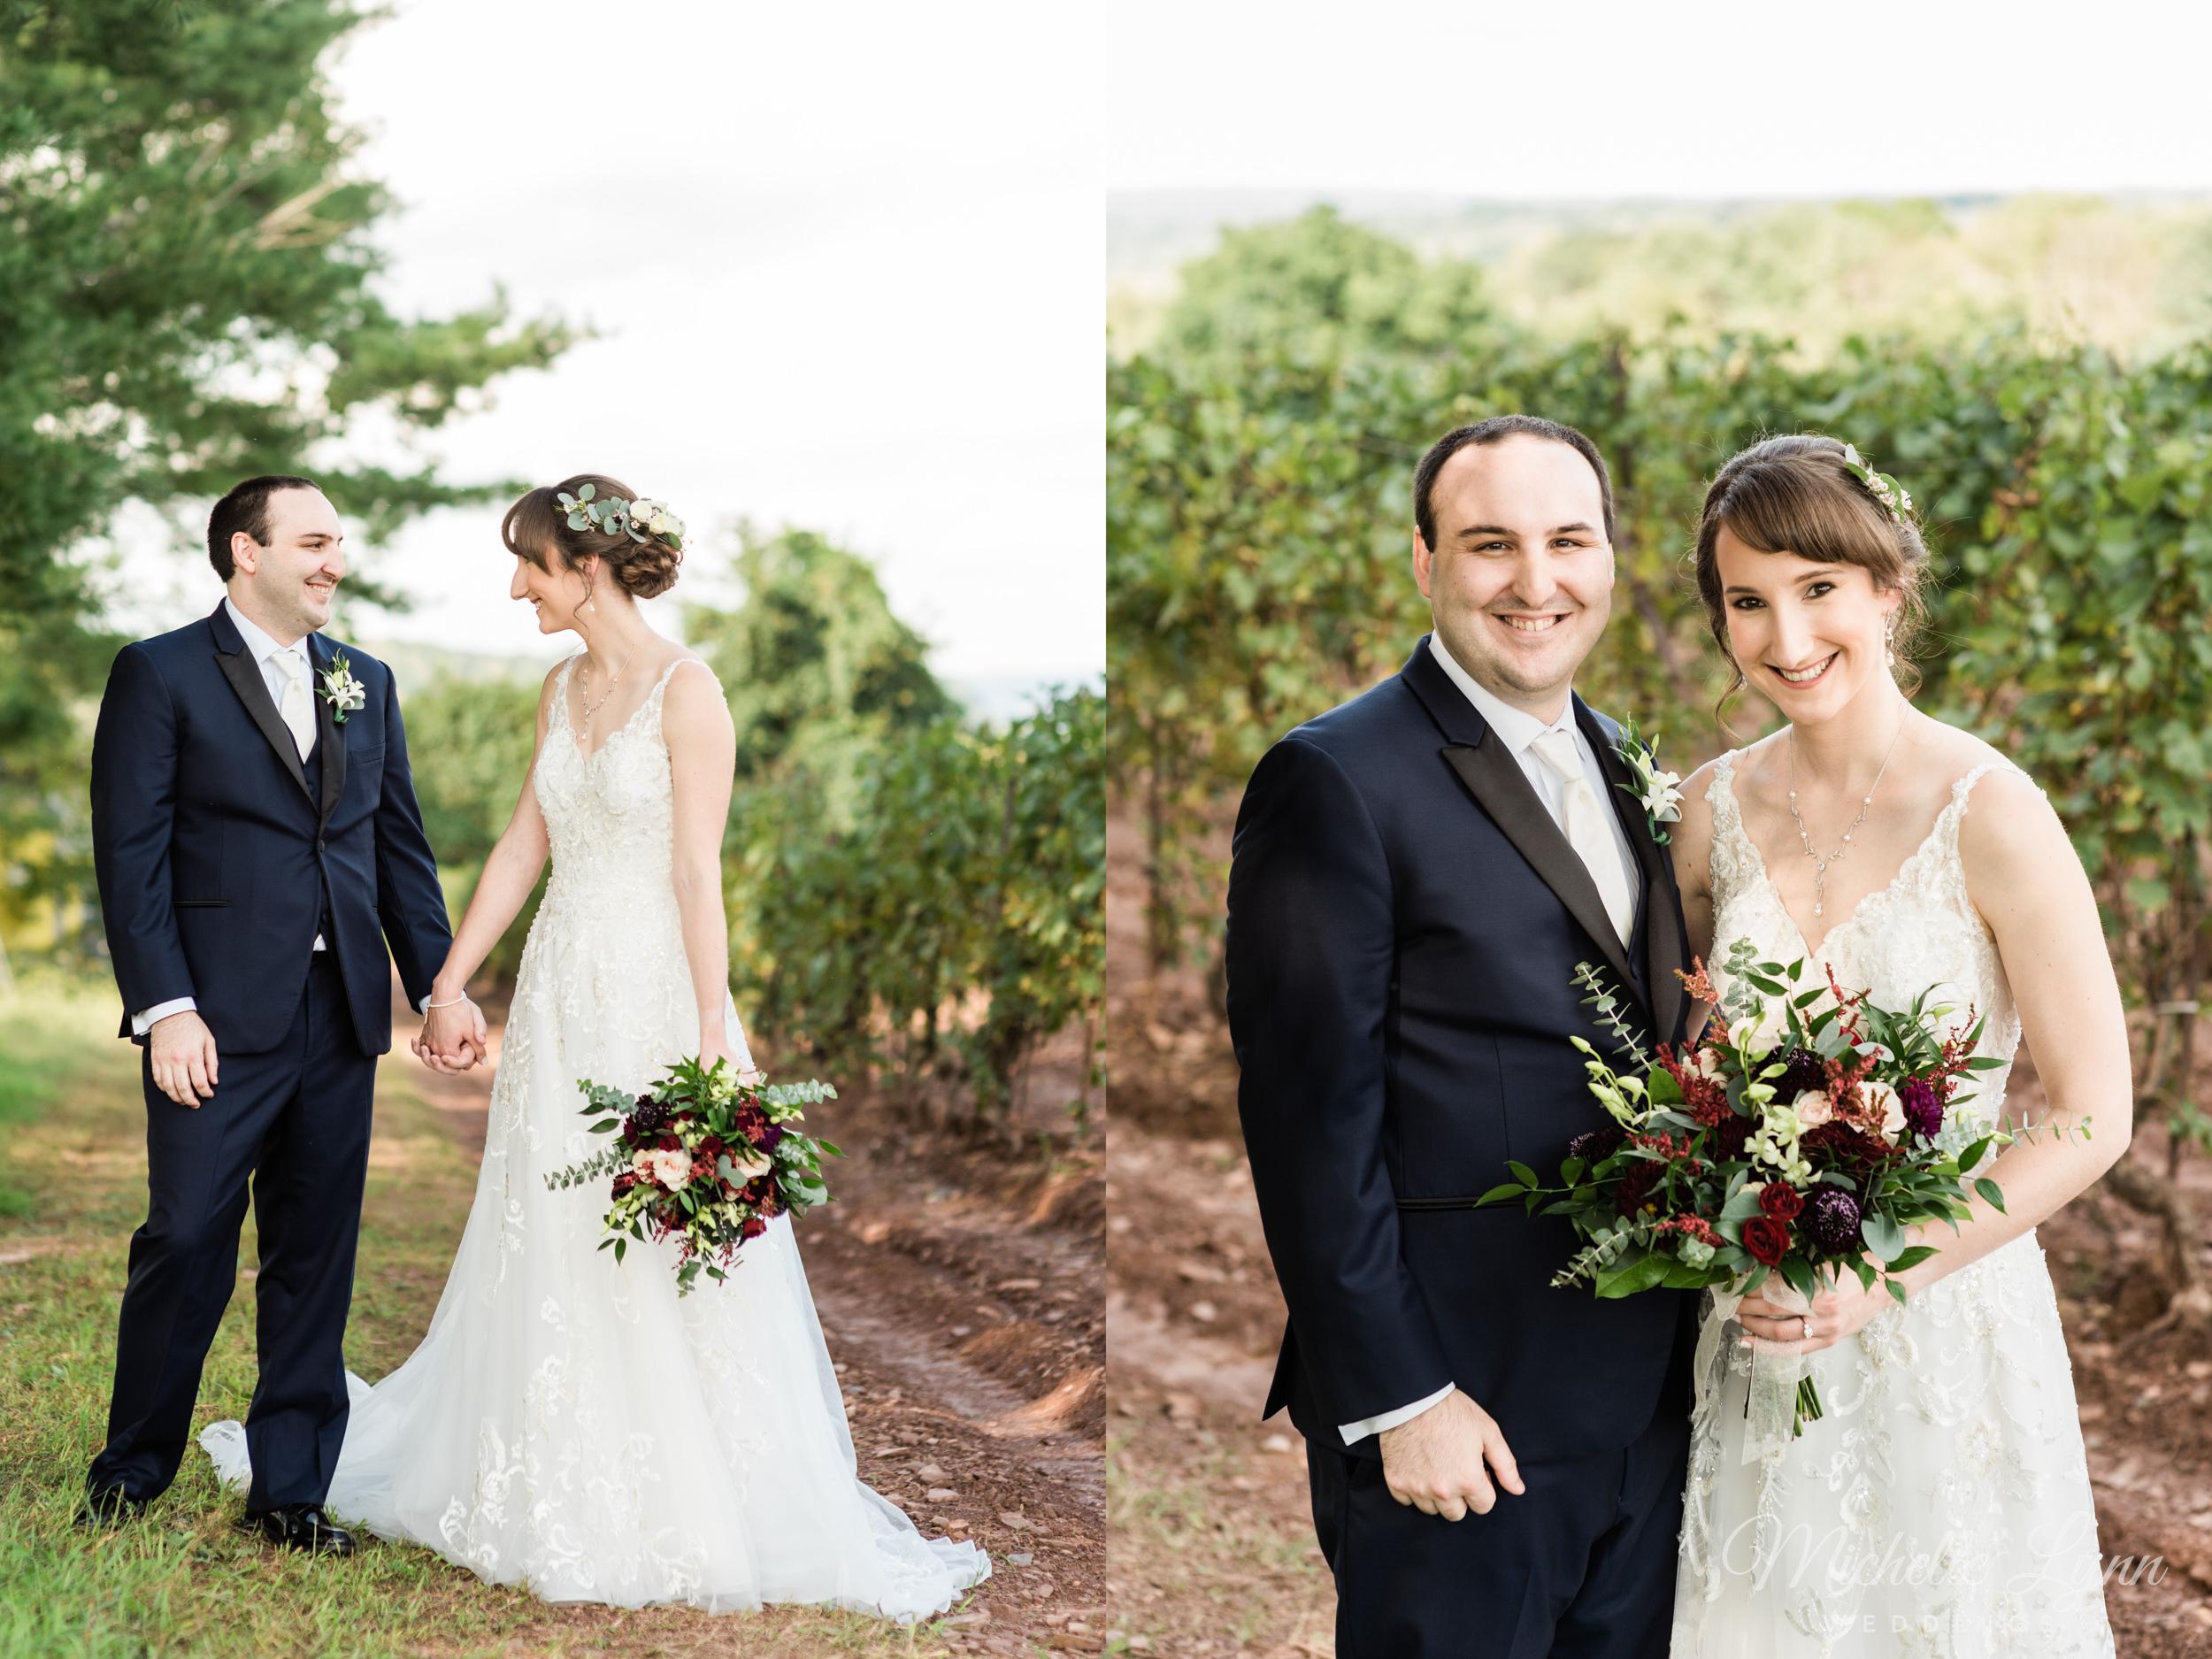 sand-castle-winery-pennsylvania-wedding-photography-45.jpg